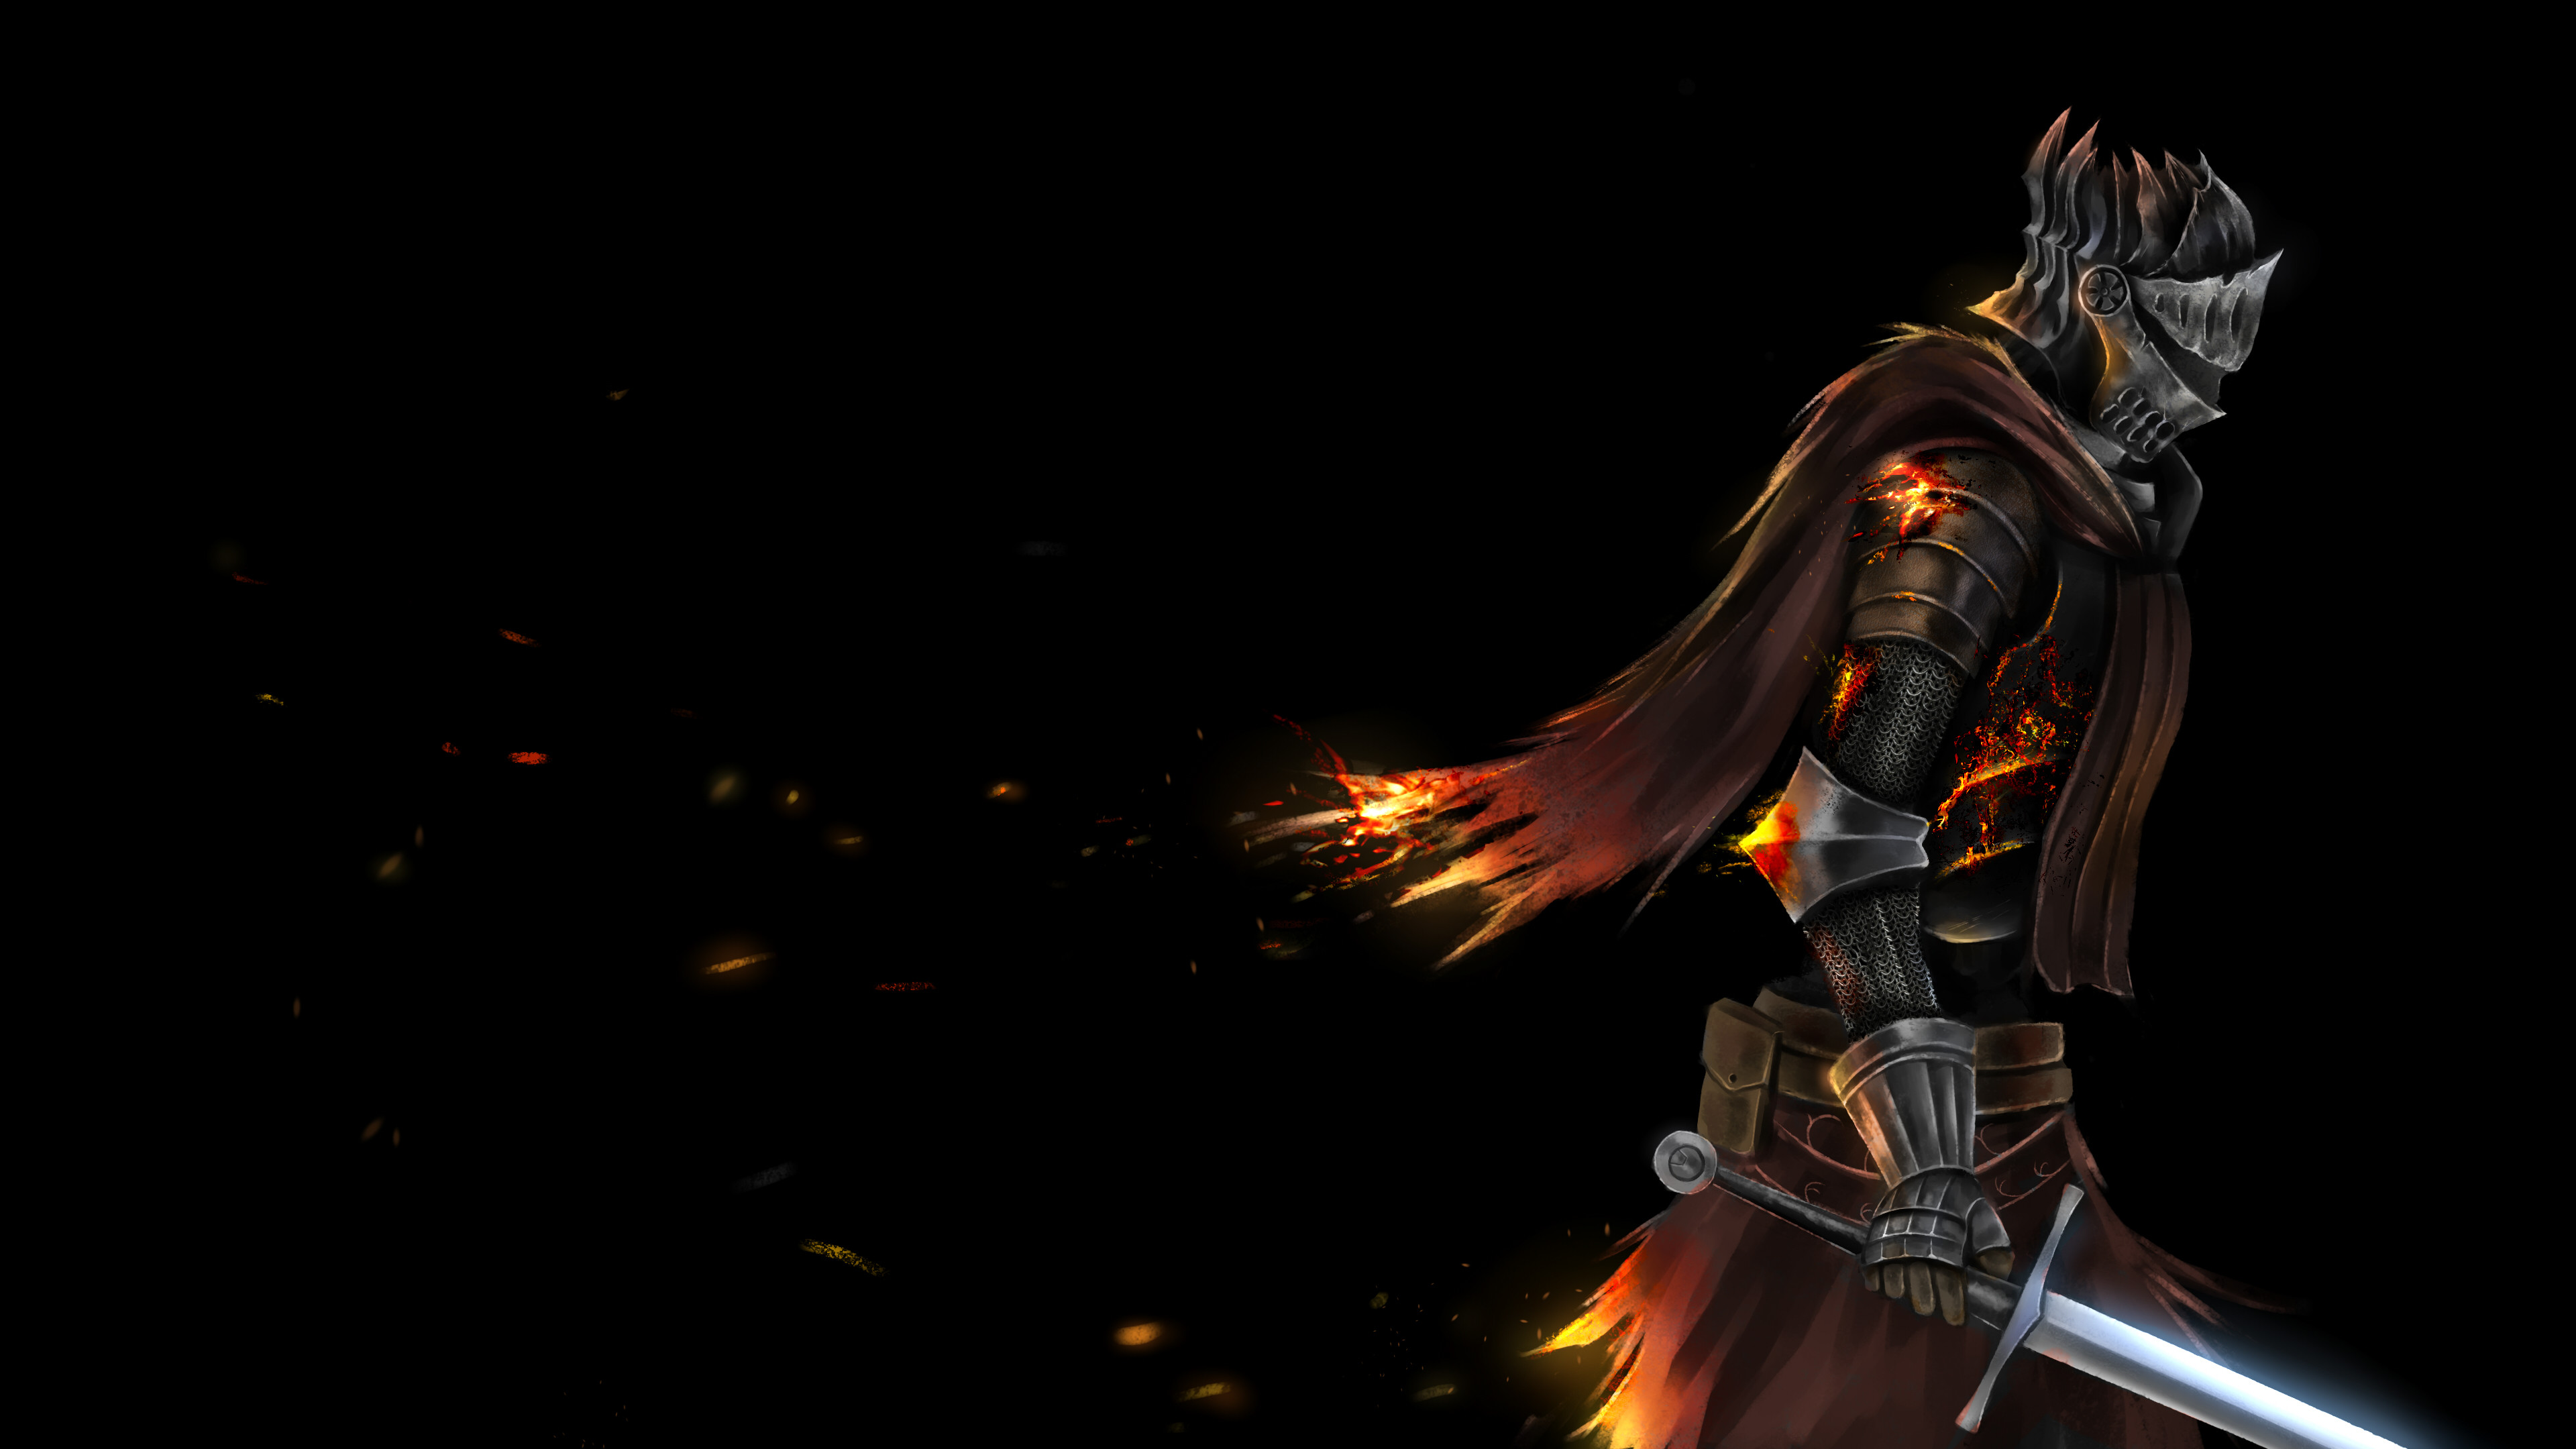 World Of Warcraft The Dark Portal Uhd 4k Wallpaper: 4K Computer Wallpaper (42+ Images